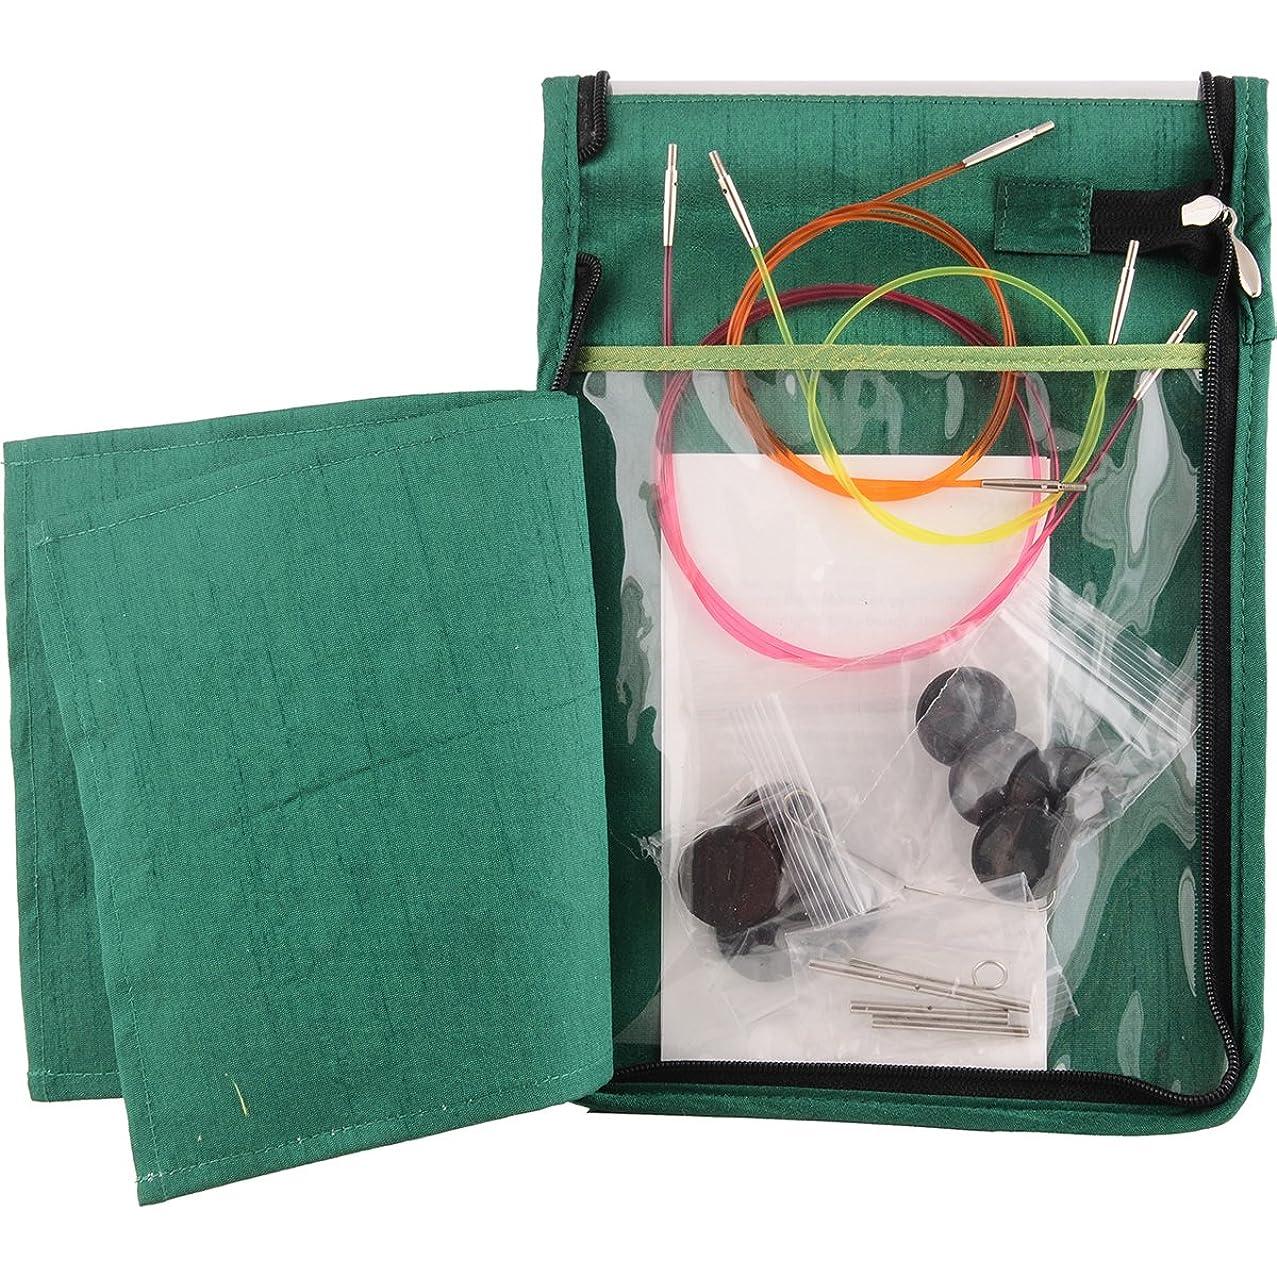 Knitter's Pride Bamboo Deluxe Interchangeable Needle Set